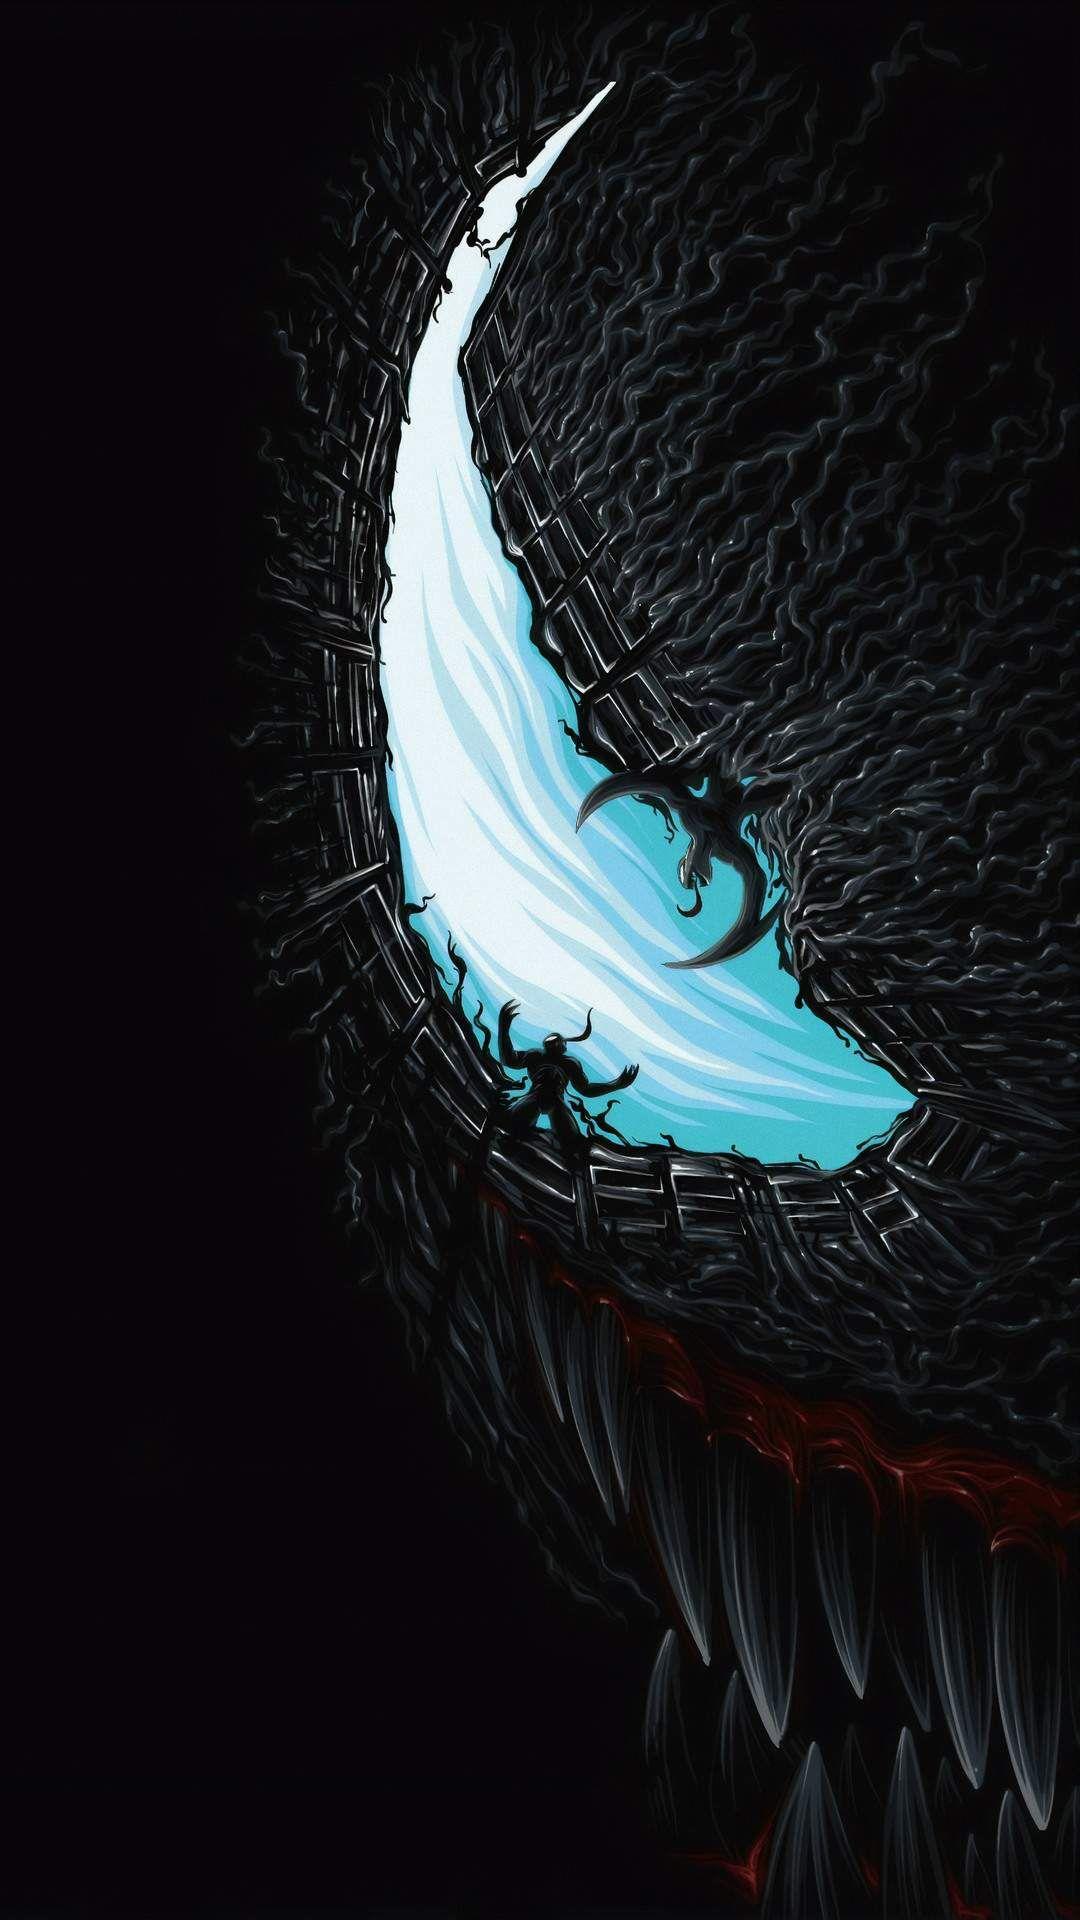 Venom Movie Artwork iPhone Wallpaper Venom movie, Marvel